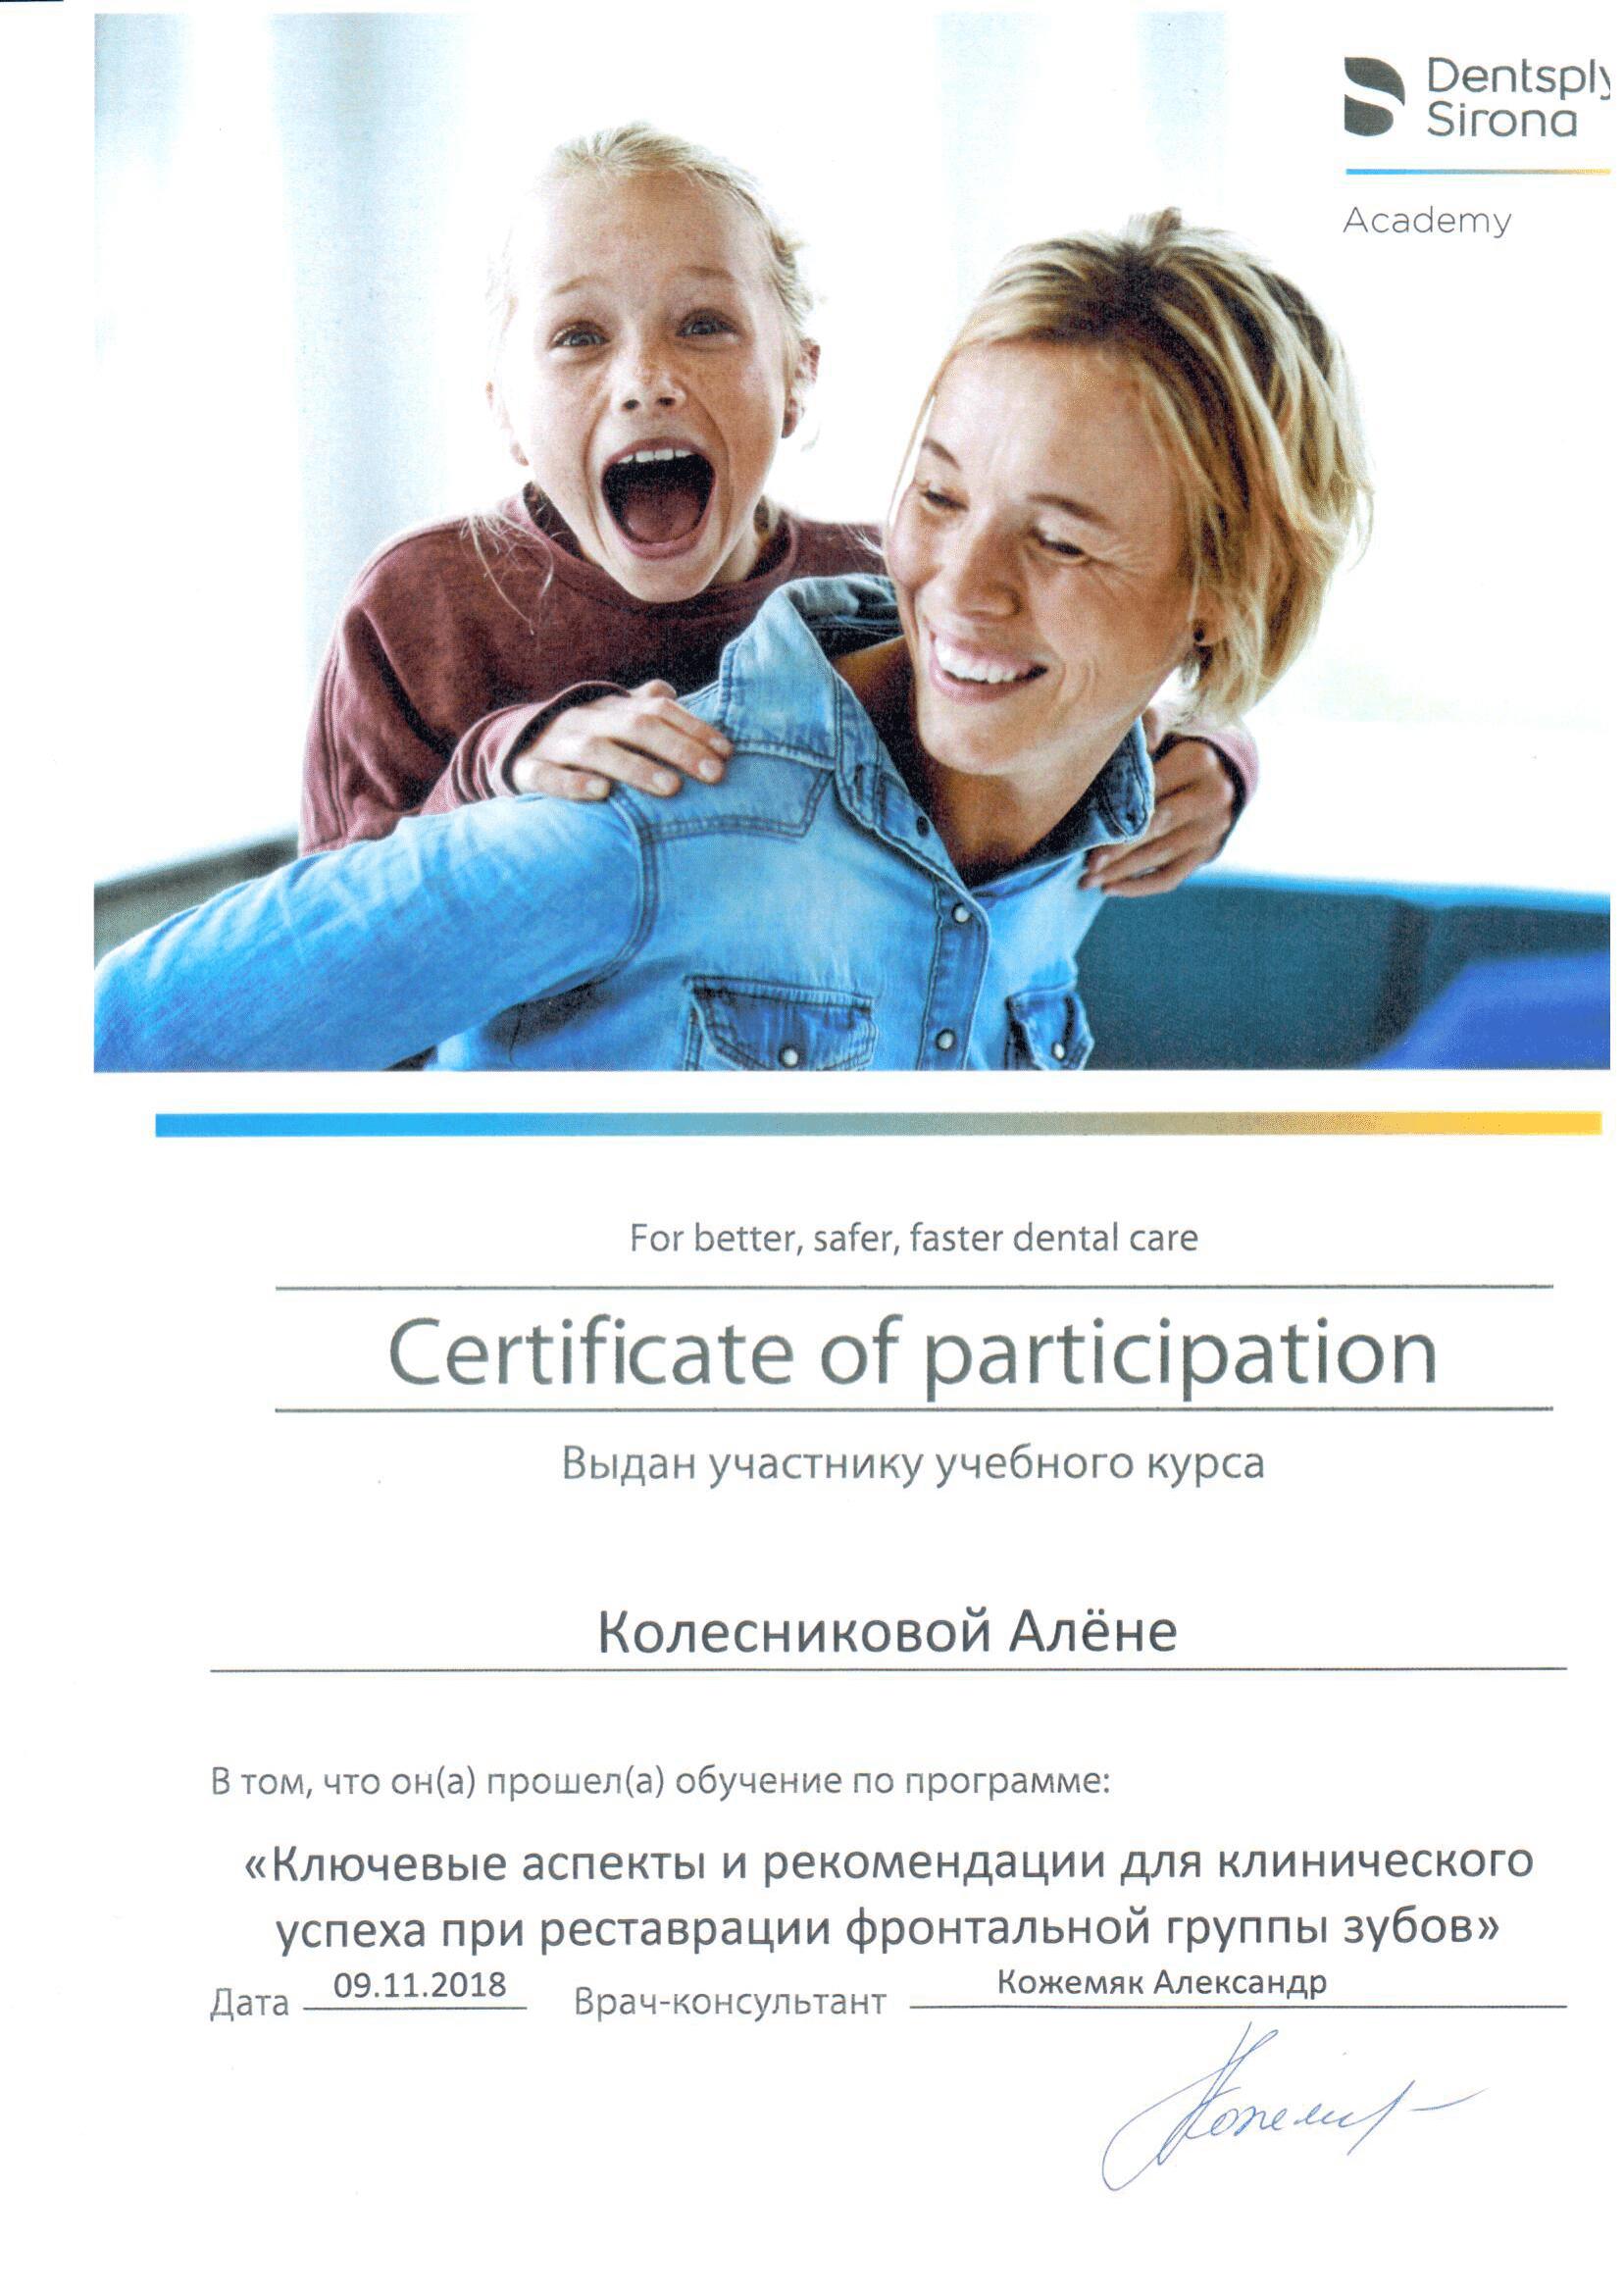 Документы на имя Колесникова Алёна Сергеевна